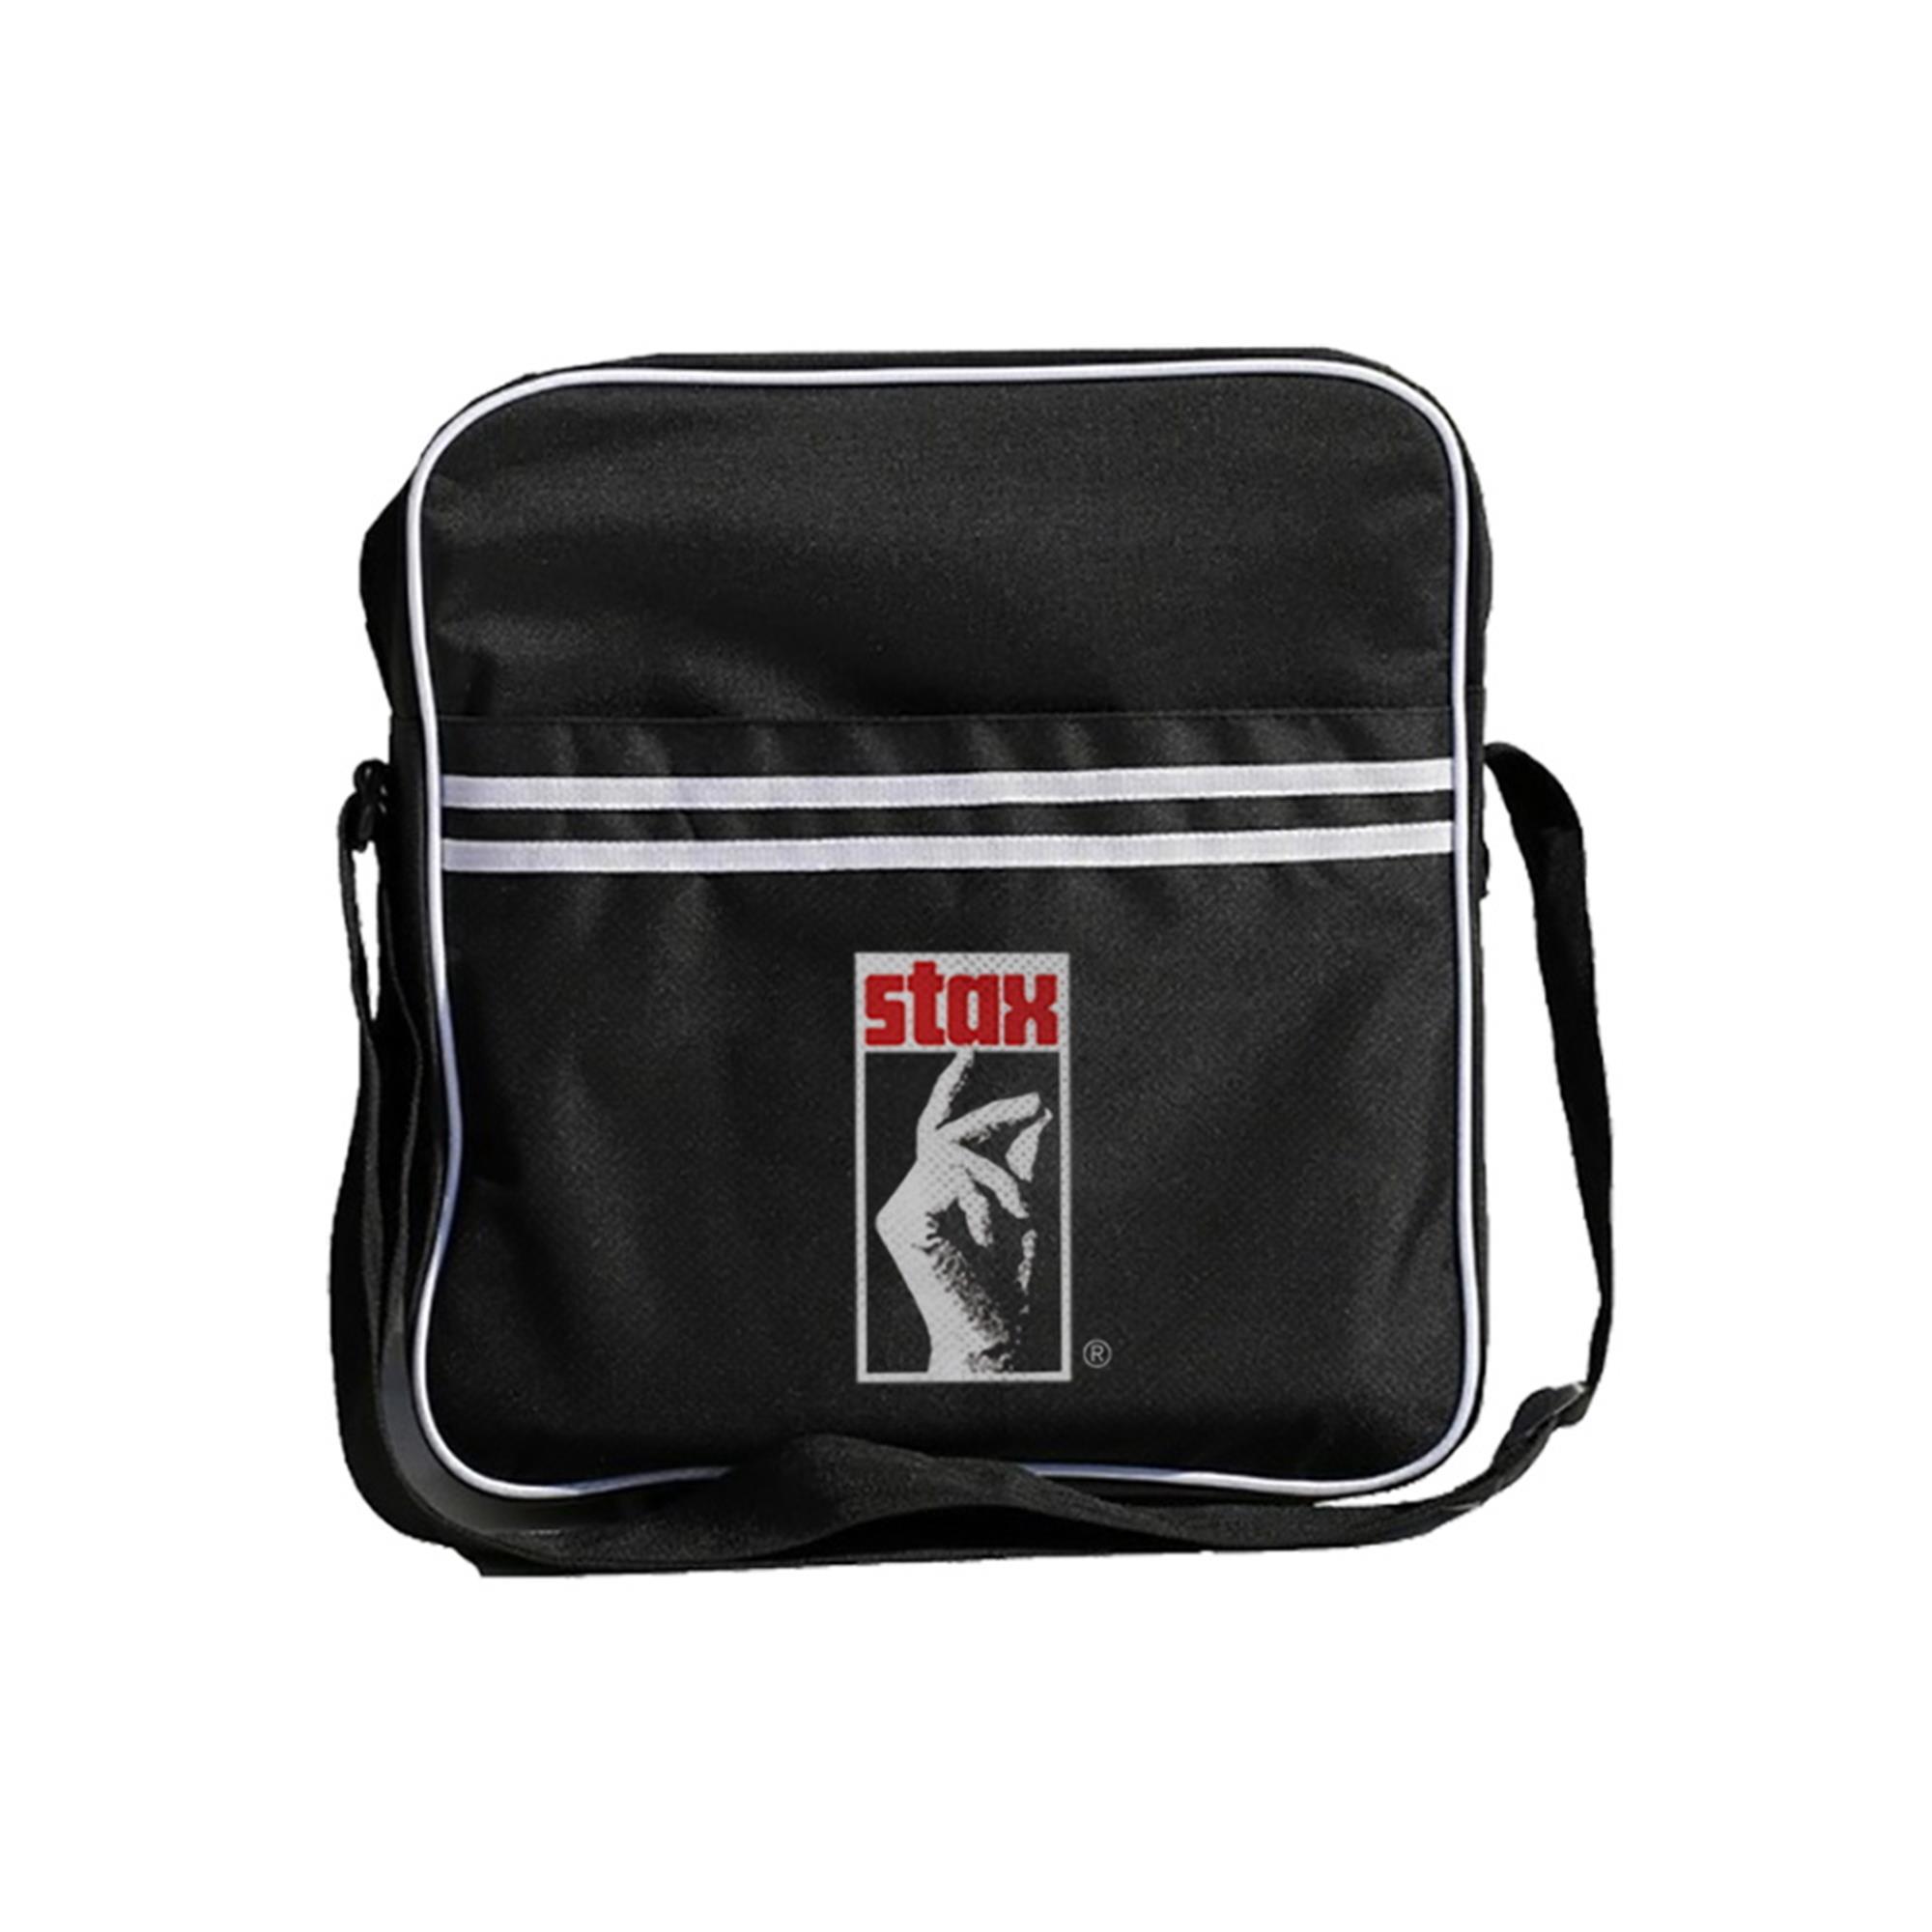 Stax Records Hand Zip Top Vinyl Record Bag